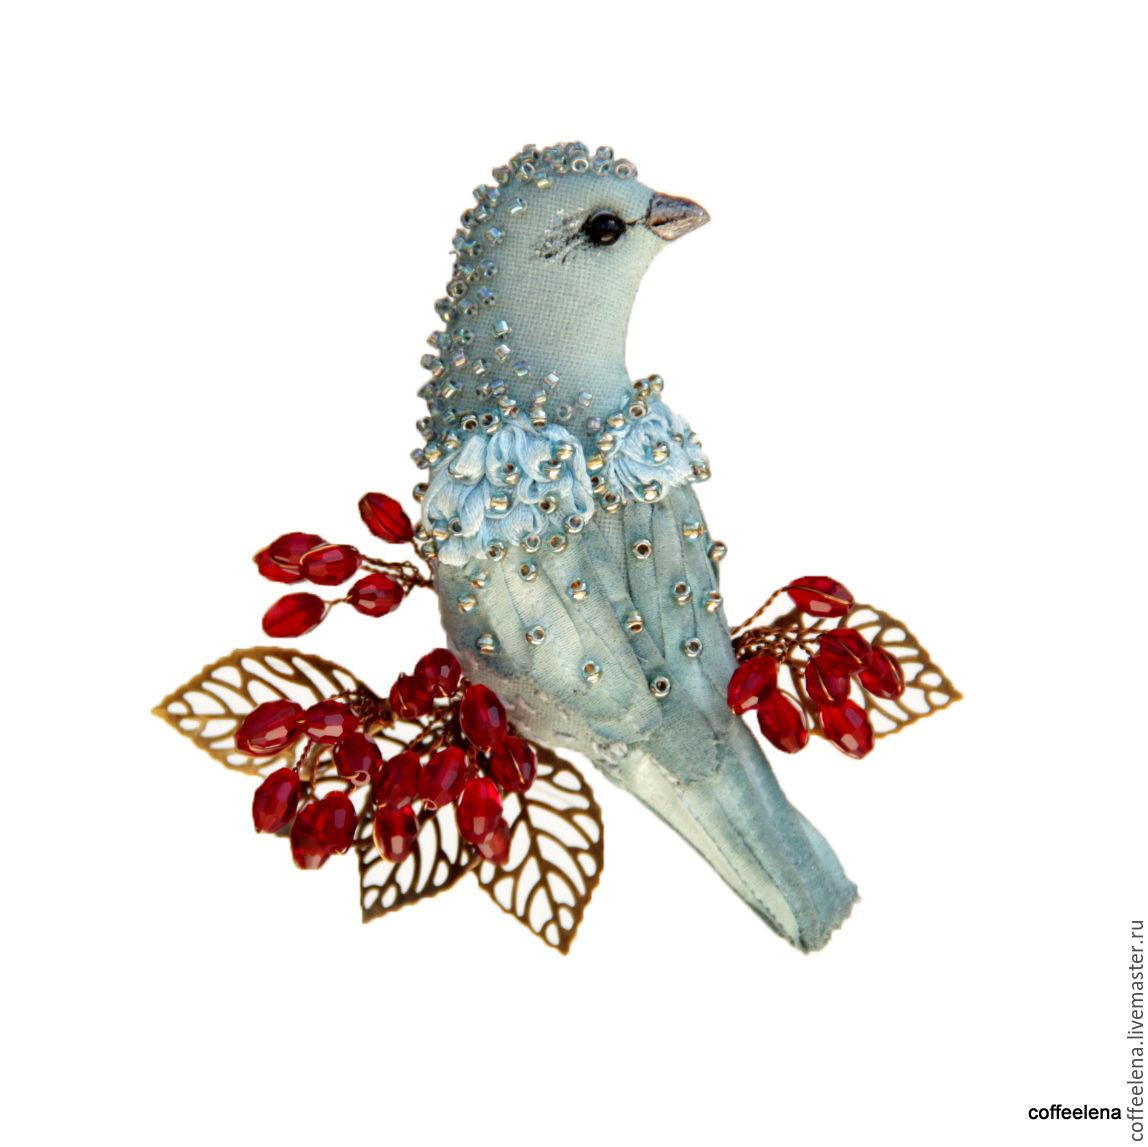 Brooch 'Bird of color denim on the branch of barberry'.Textile brooch-bird, Brooches, Krasnodar,  Фото №1